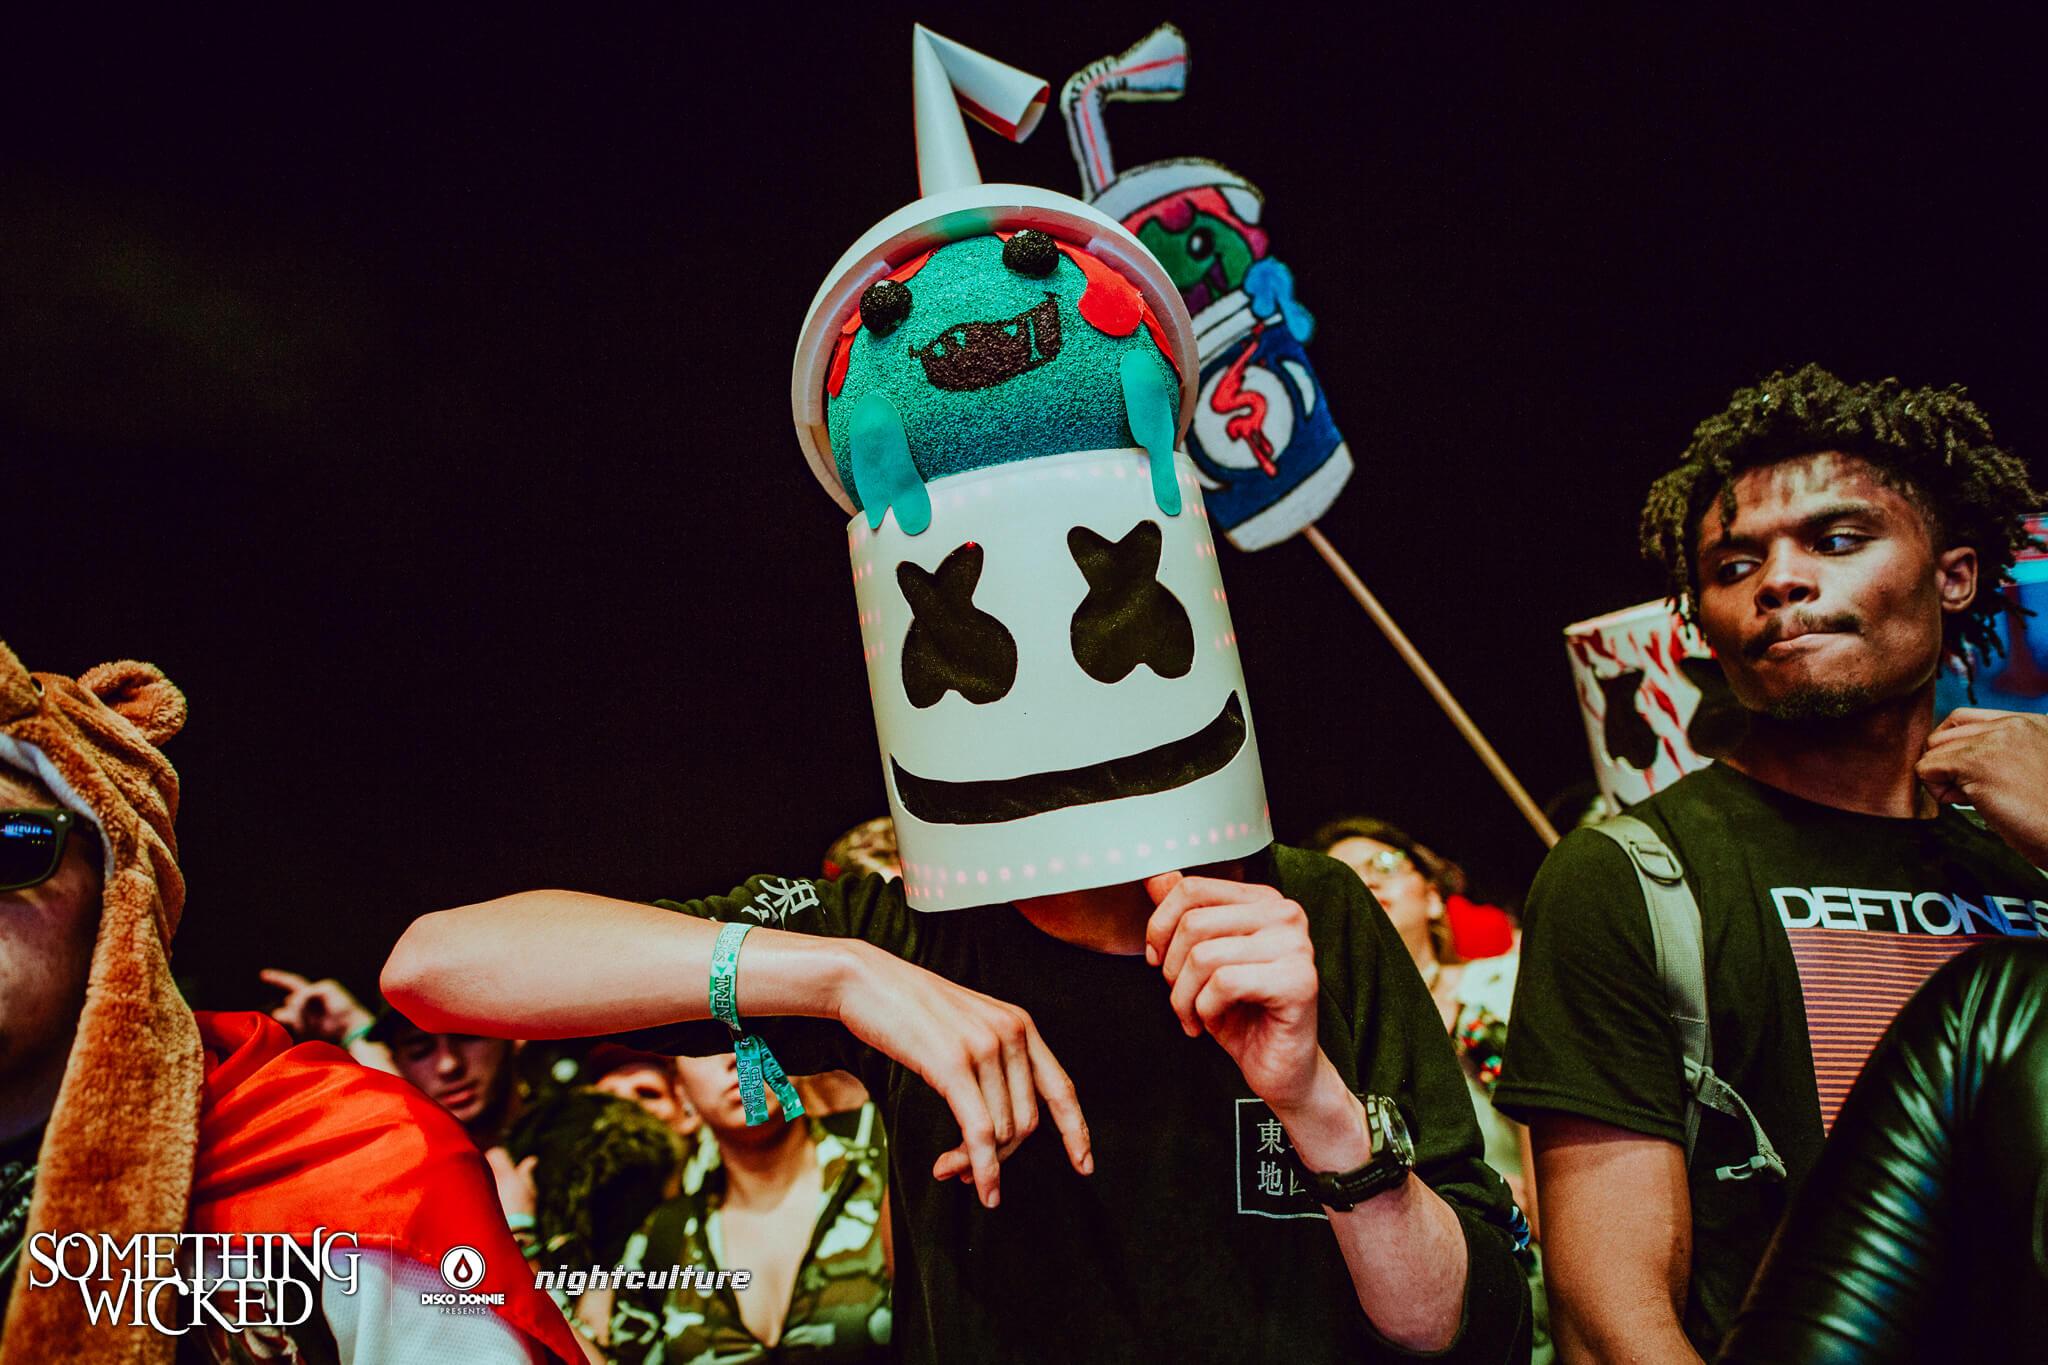 Fan in costume at Something Wicked. Photo by Julian Bajsel.